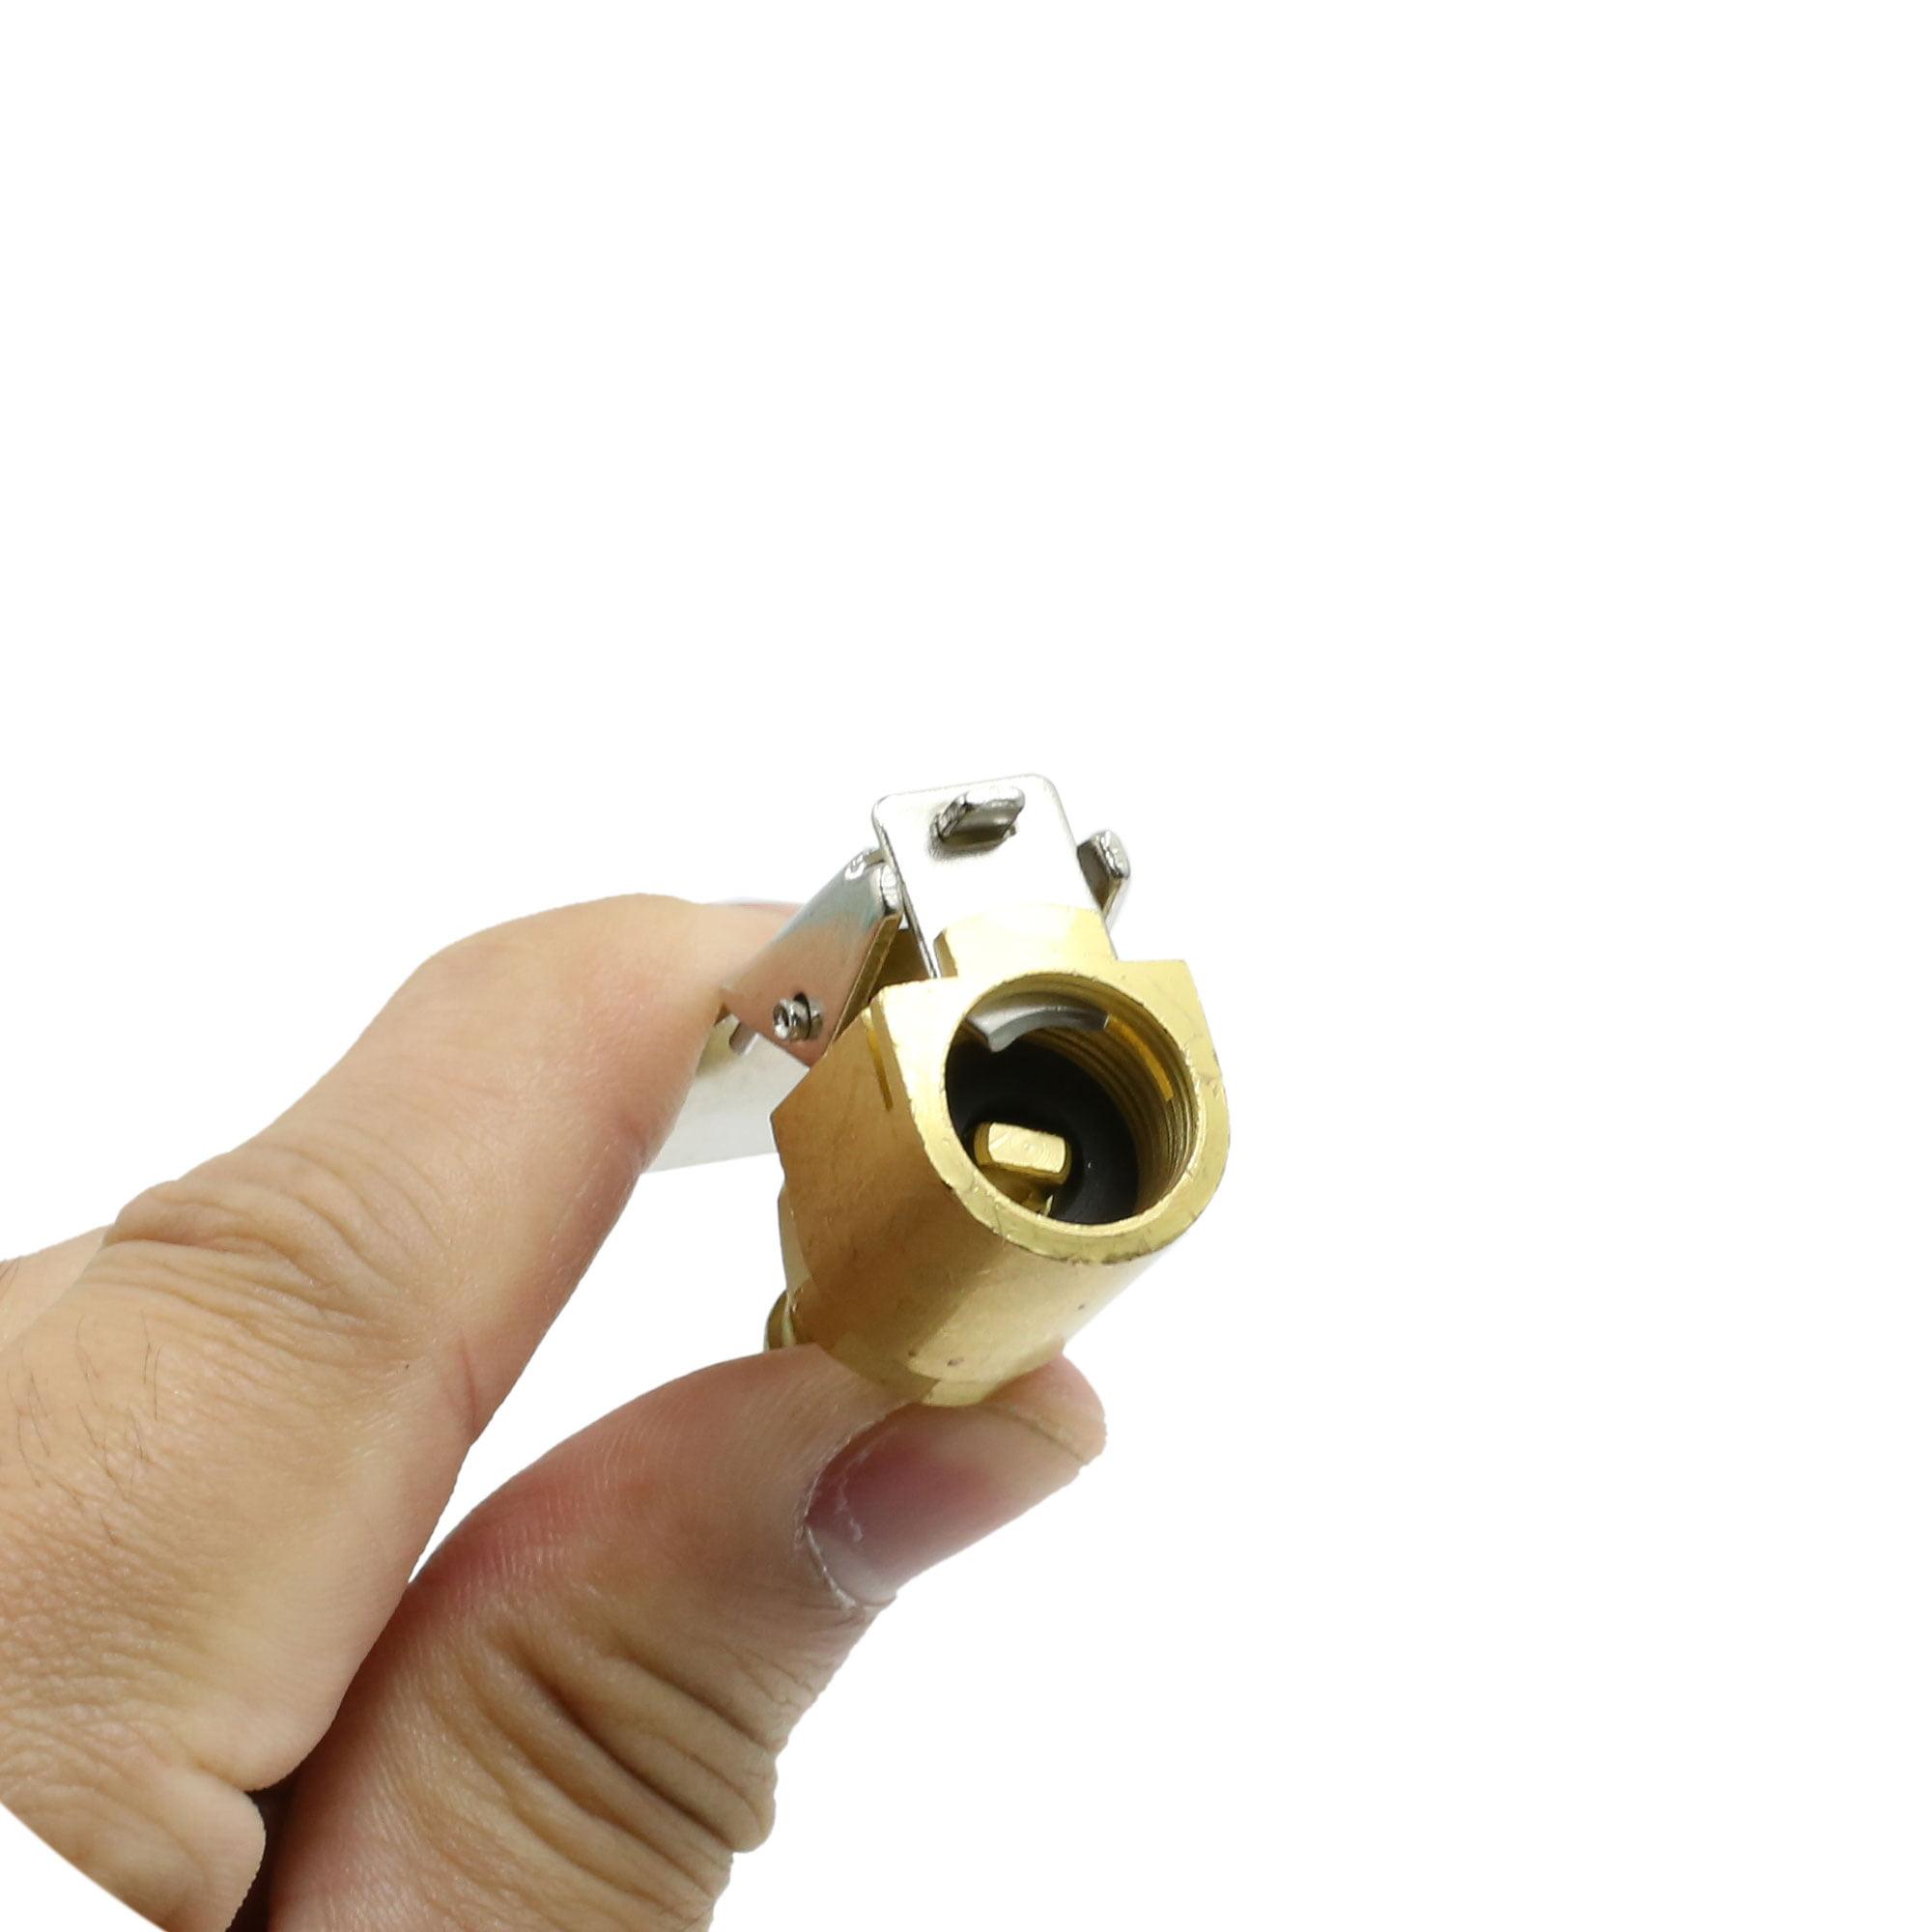 6 Piece Copper Alloy Tire Tyre Valve Air Pump Nozzle Hose Adapter Connecter